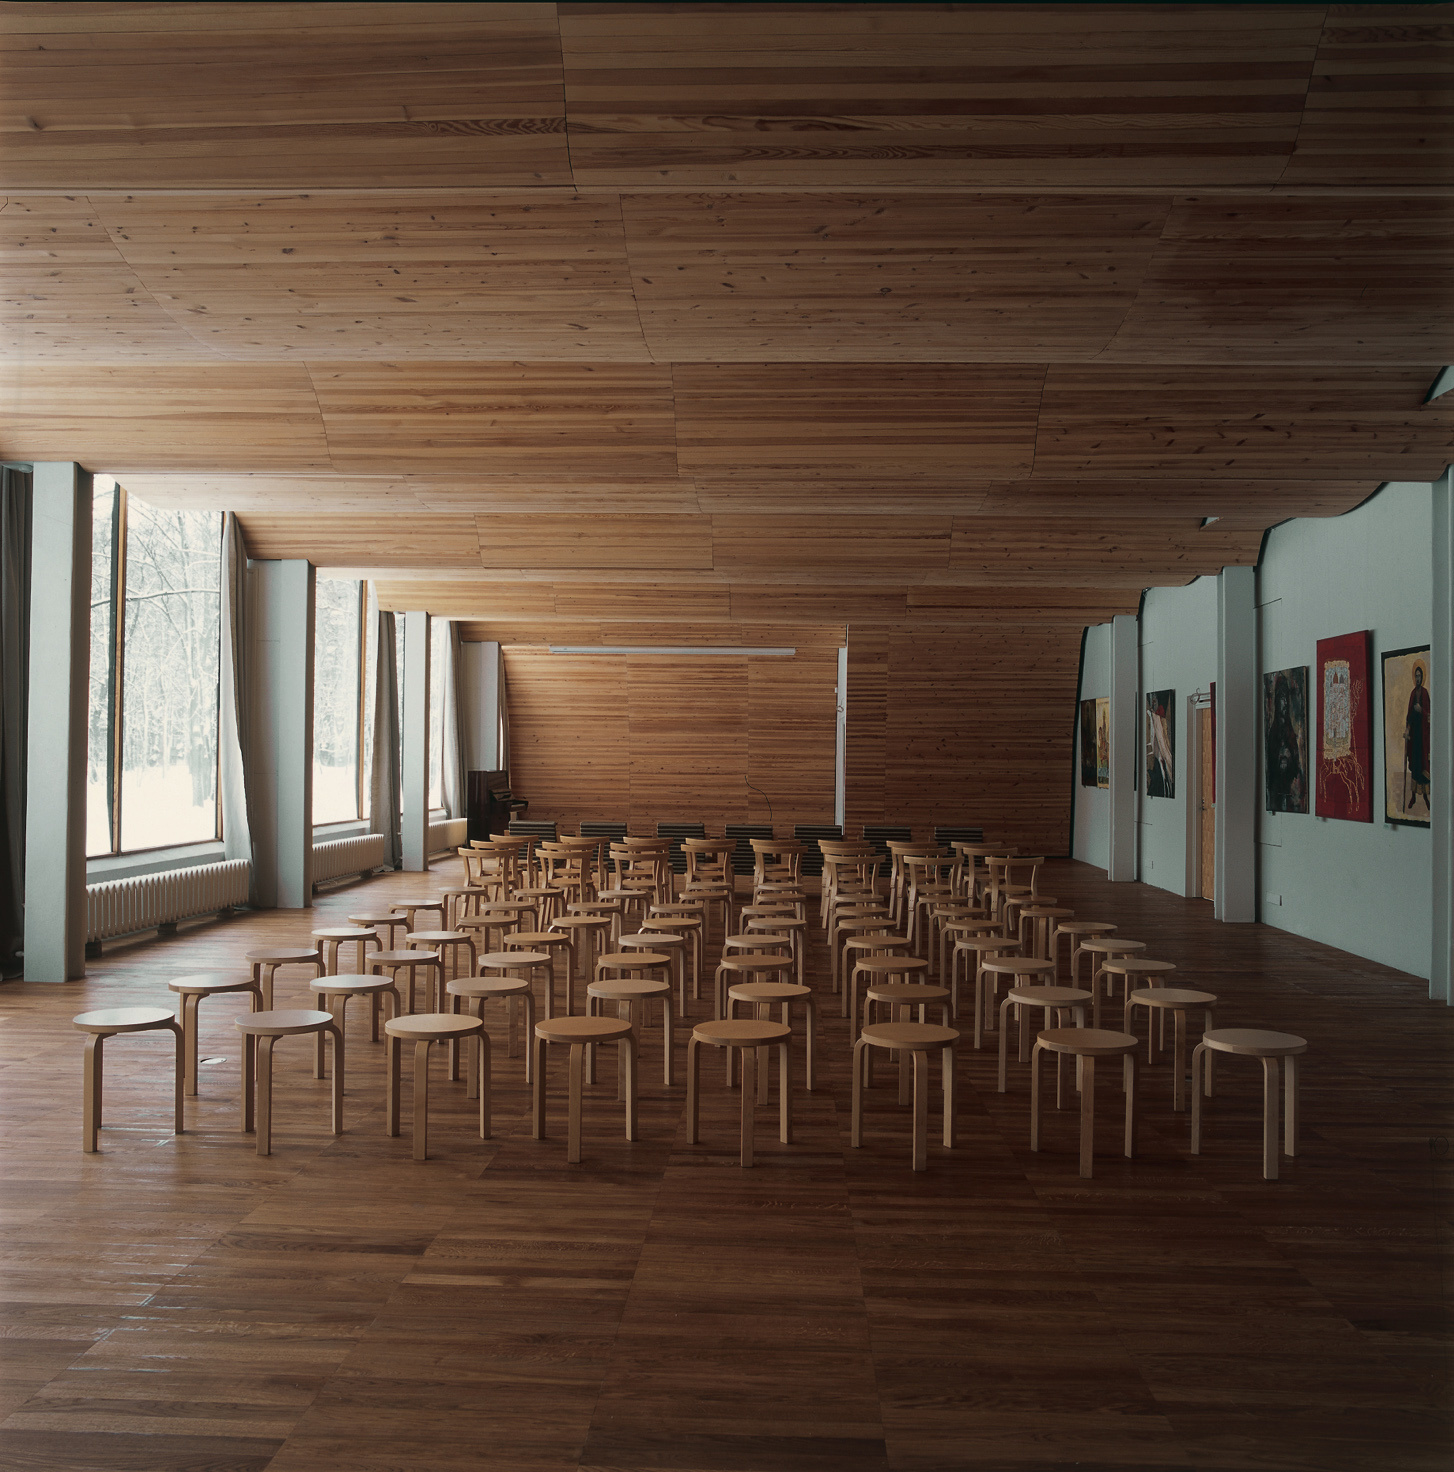 История дизайна: Айно и Алвар Аалто (галерея 13, фото 1)